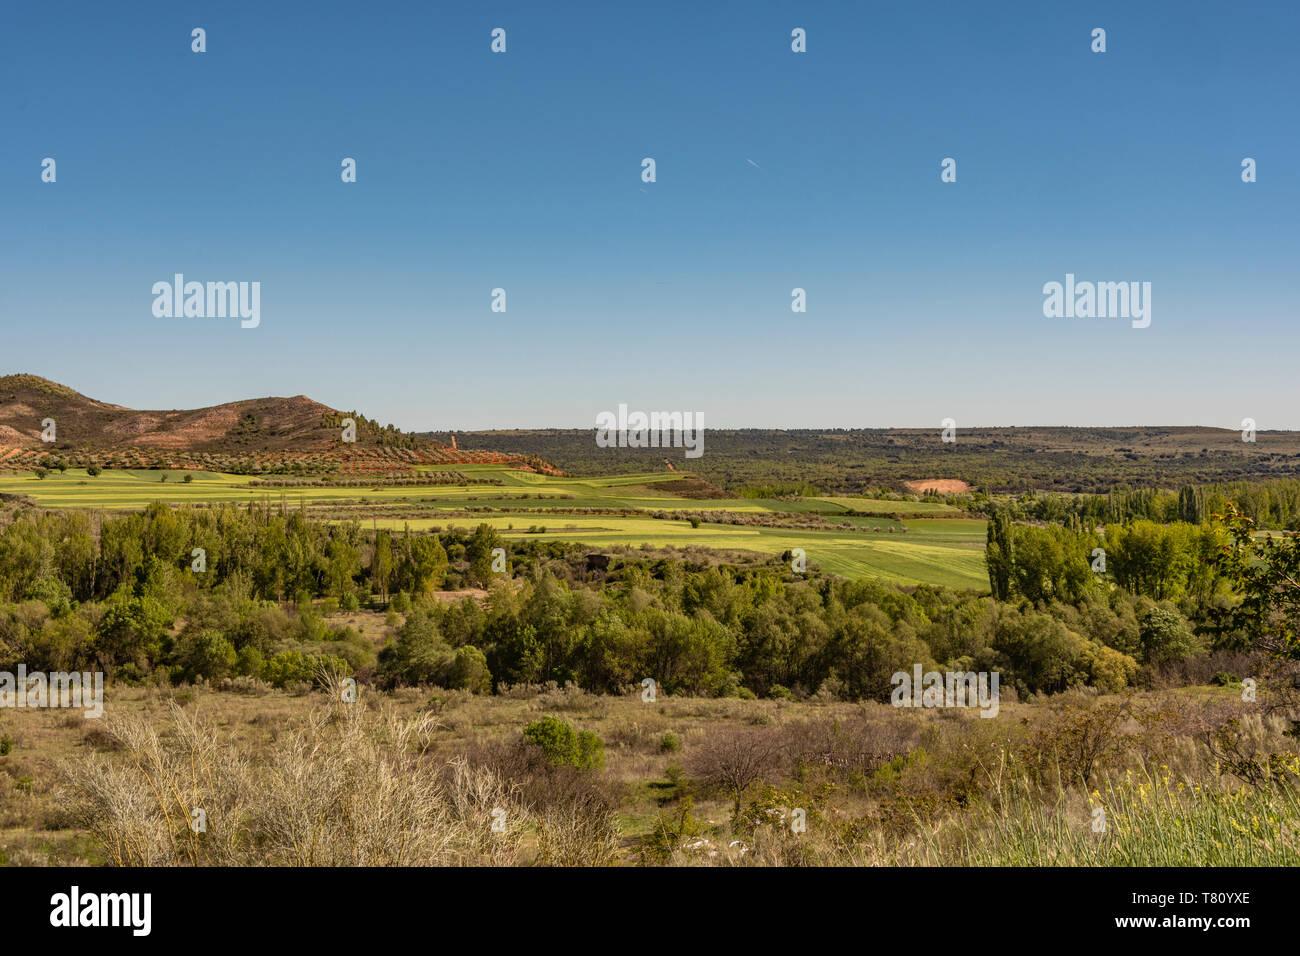 prairies and fields planted in the sierra de guadarrama. madrid Spain. Stock Photo